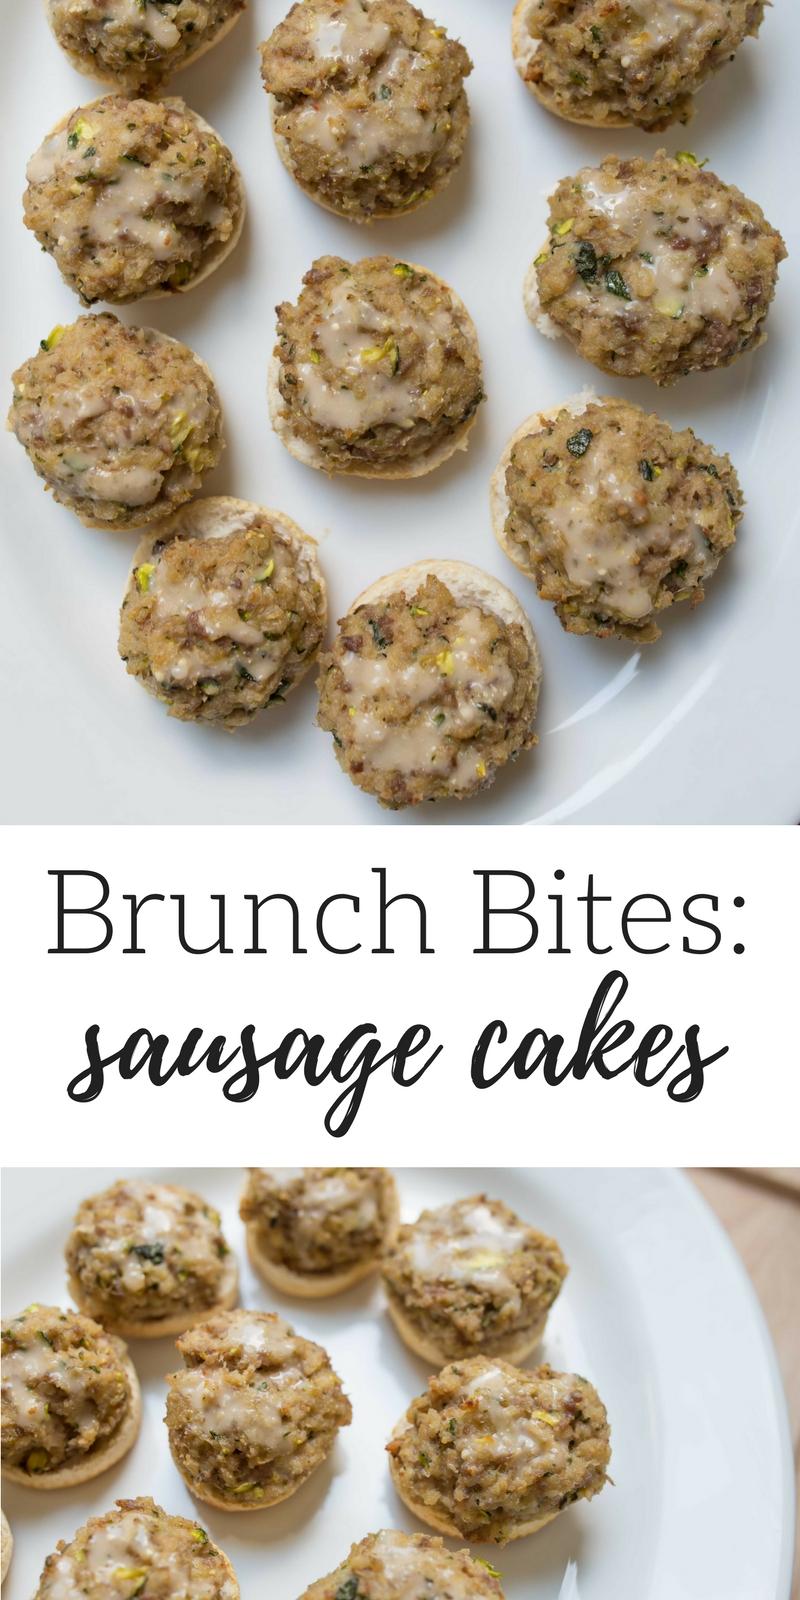 Sausage Cake Recipe by Atlanta blogger Casual Claire